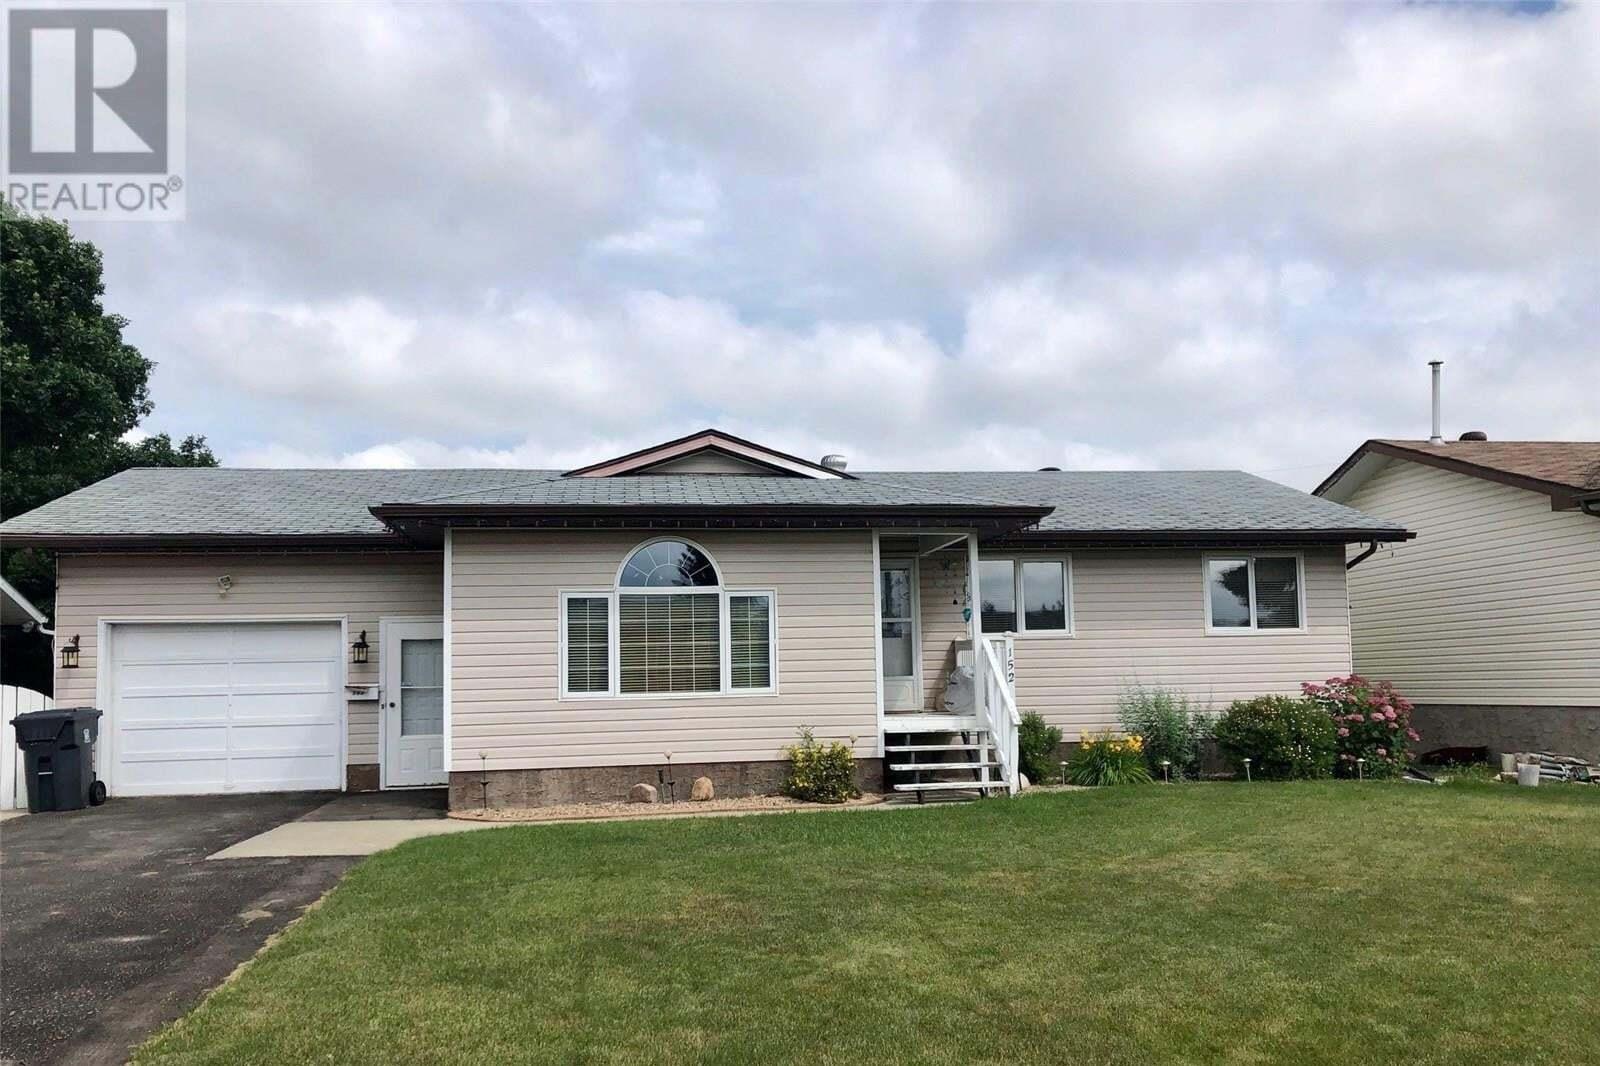 House for sale at 152 17th St Battleford Saskatchewan - MLS: SK819076